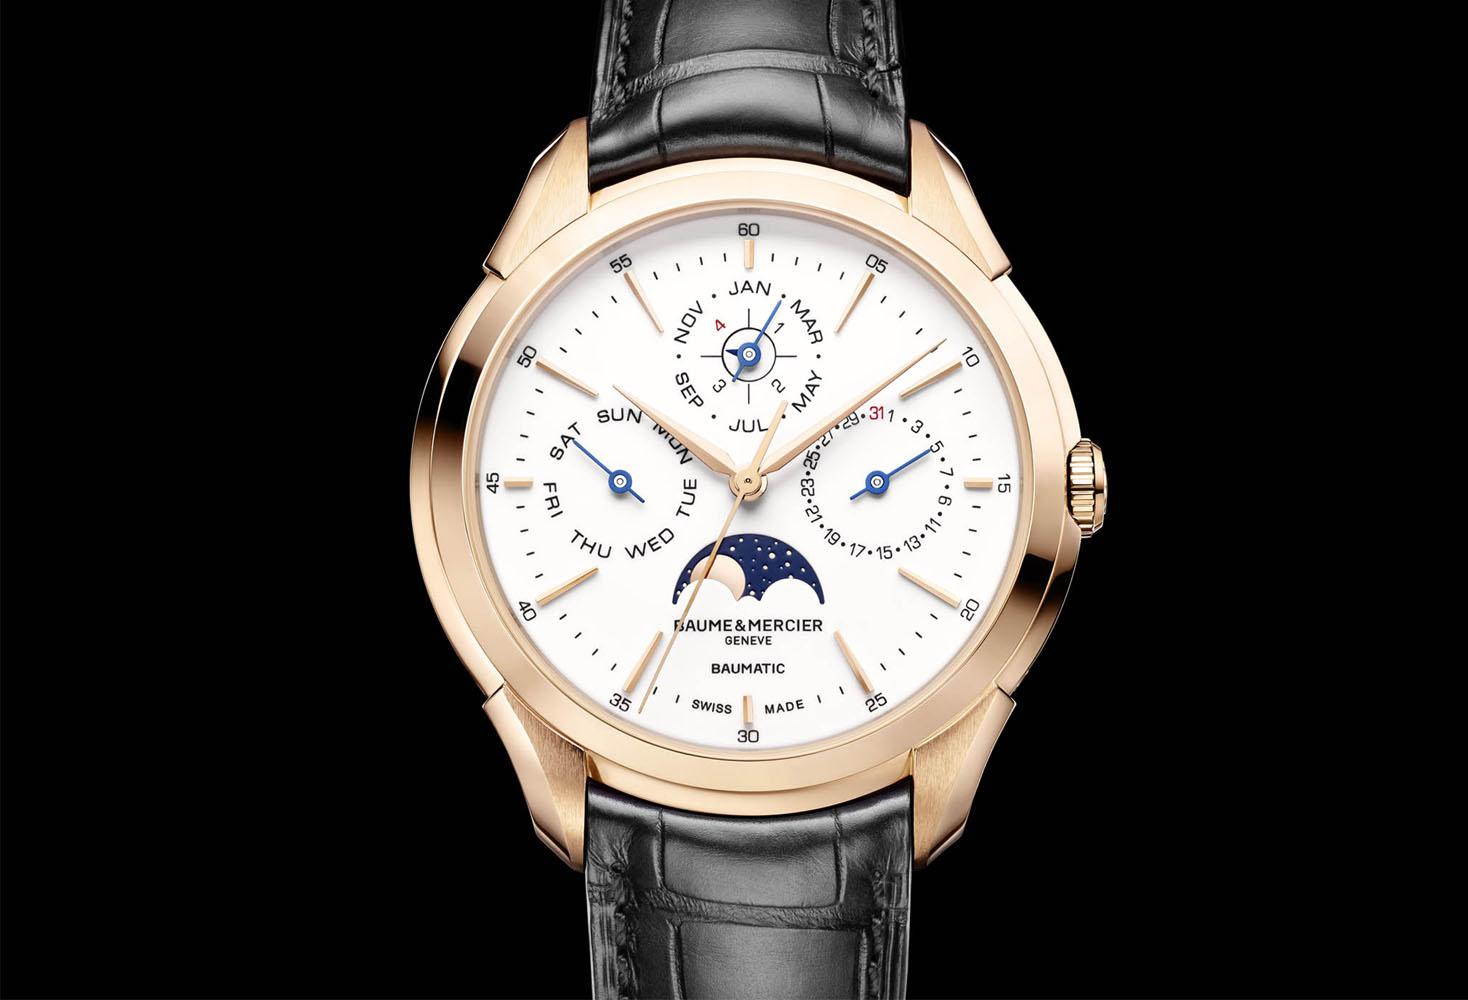 Baume-Mercier-Baumatic-Perpetual-Calendar:Best Watches Of SIHH 2019